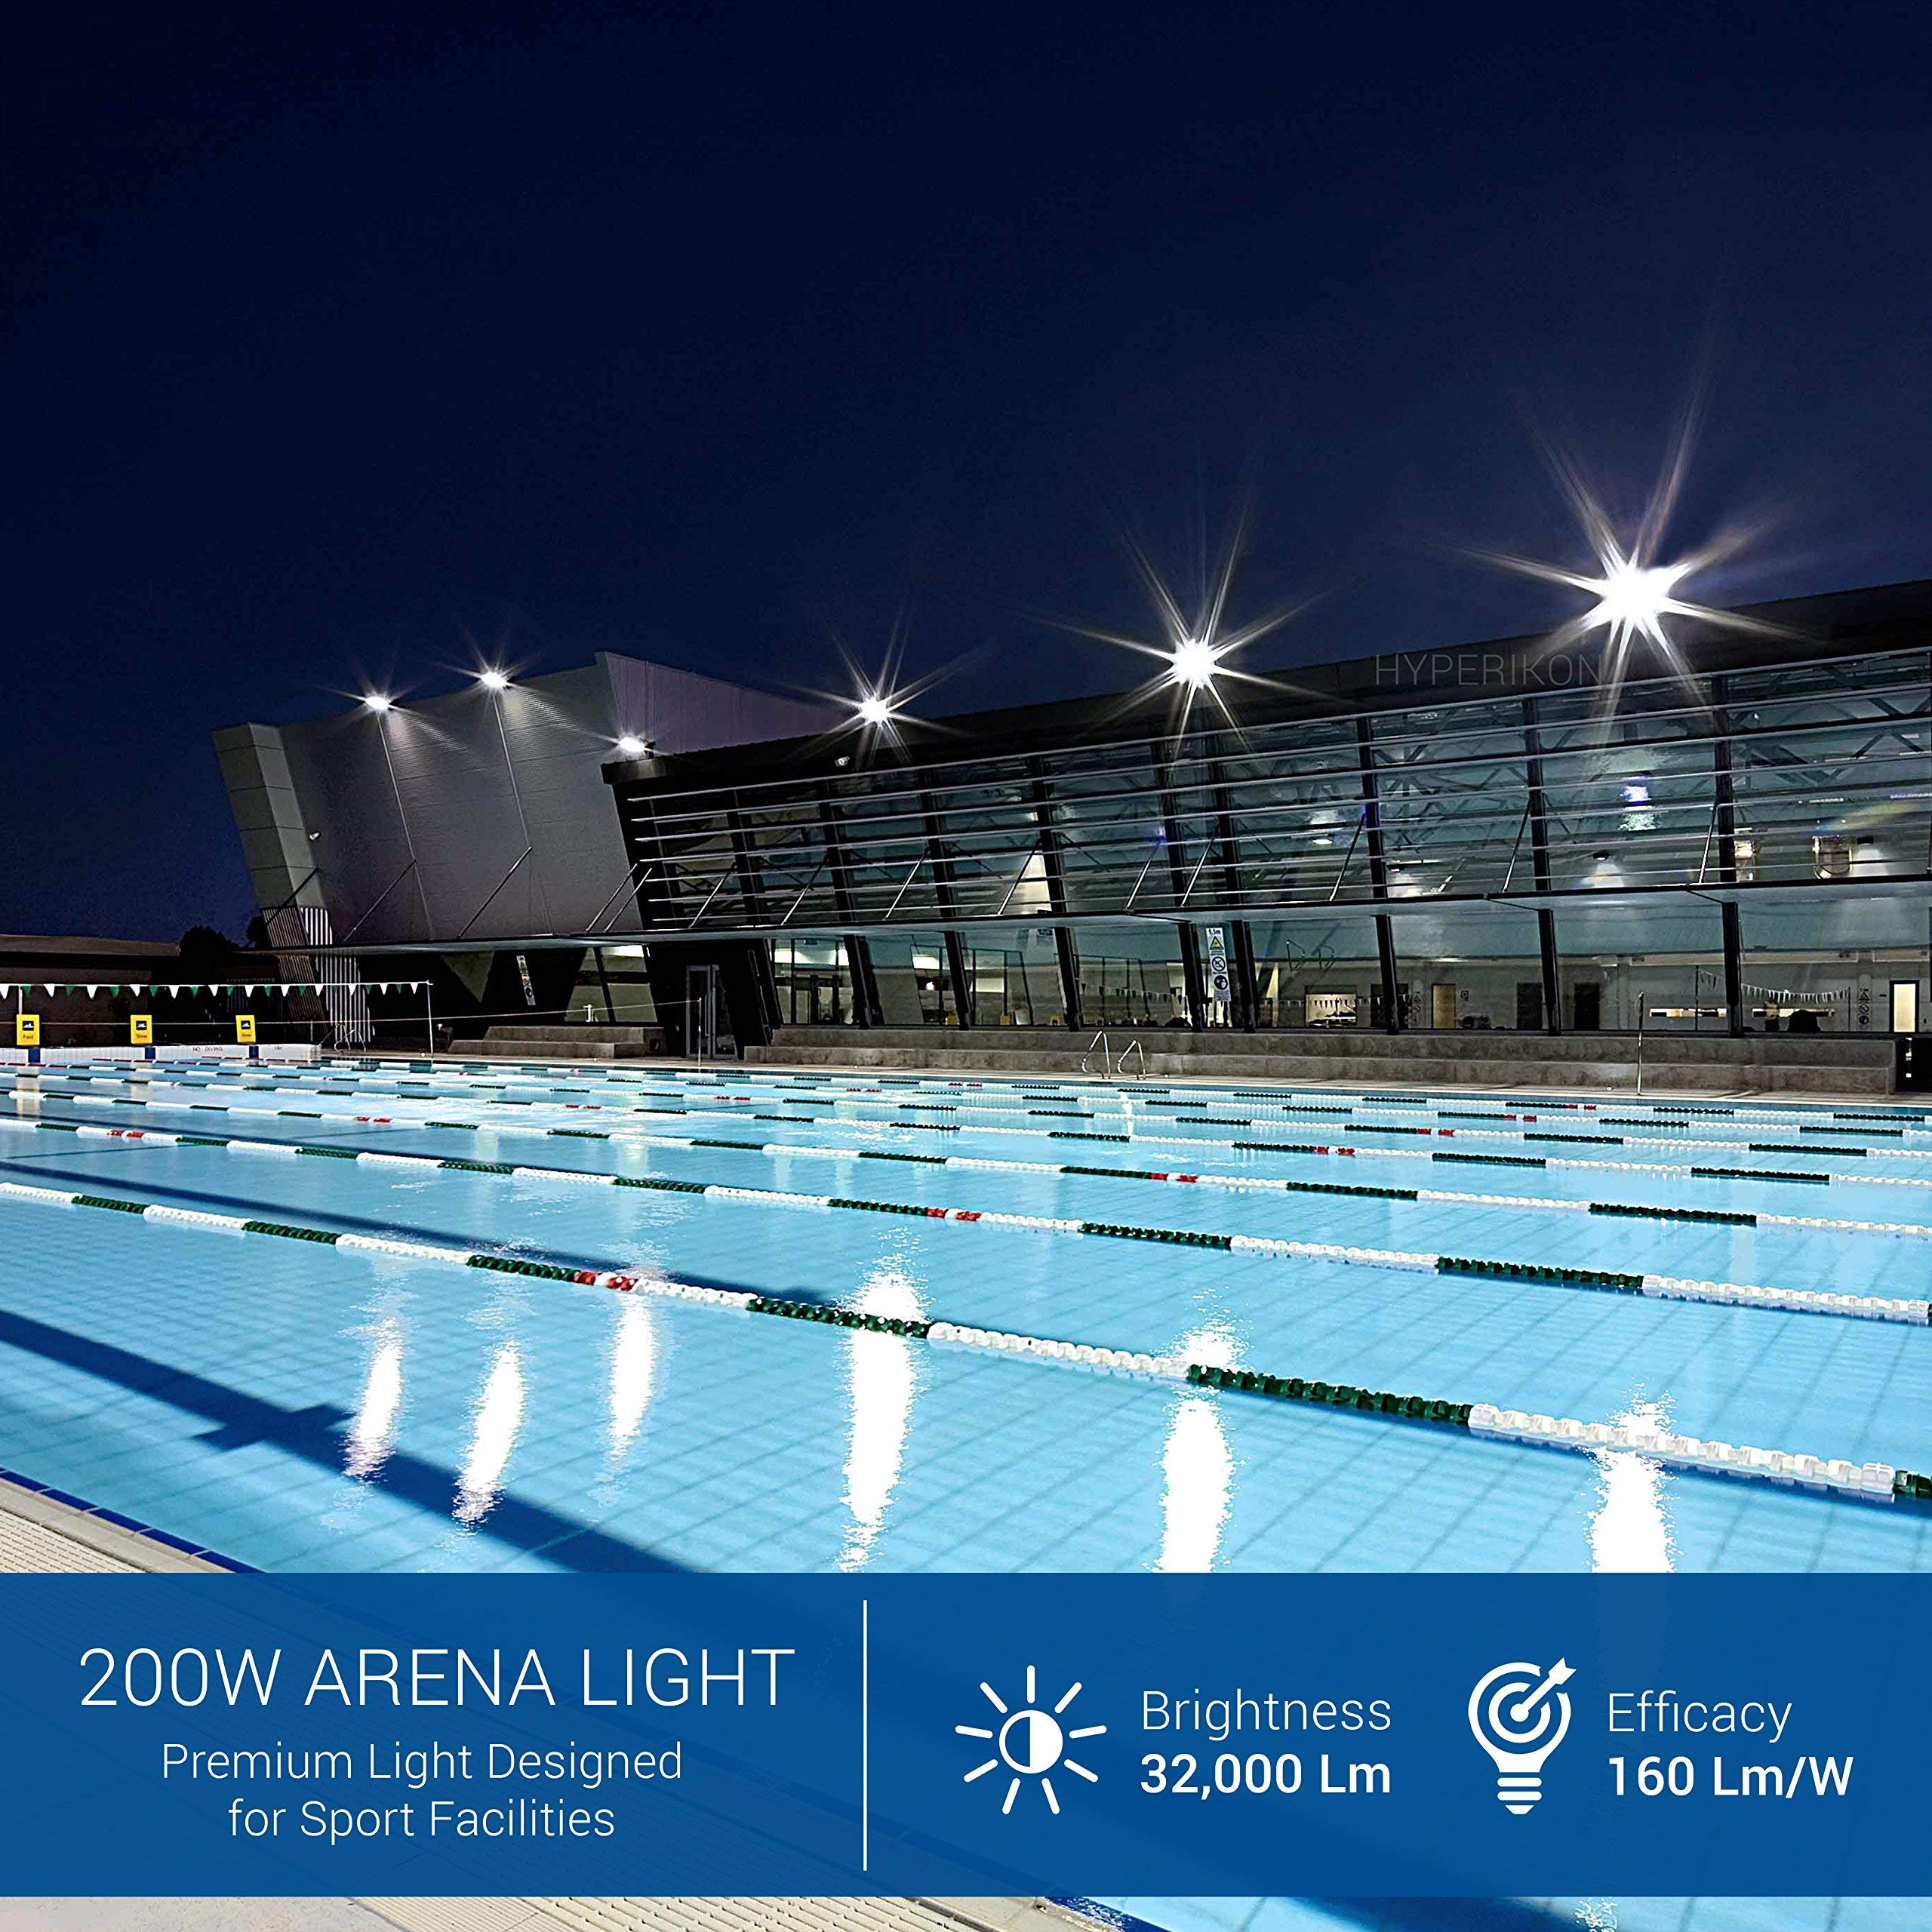 Hyperikon Pro LED Stadium Light, 200W Flood